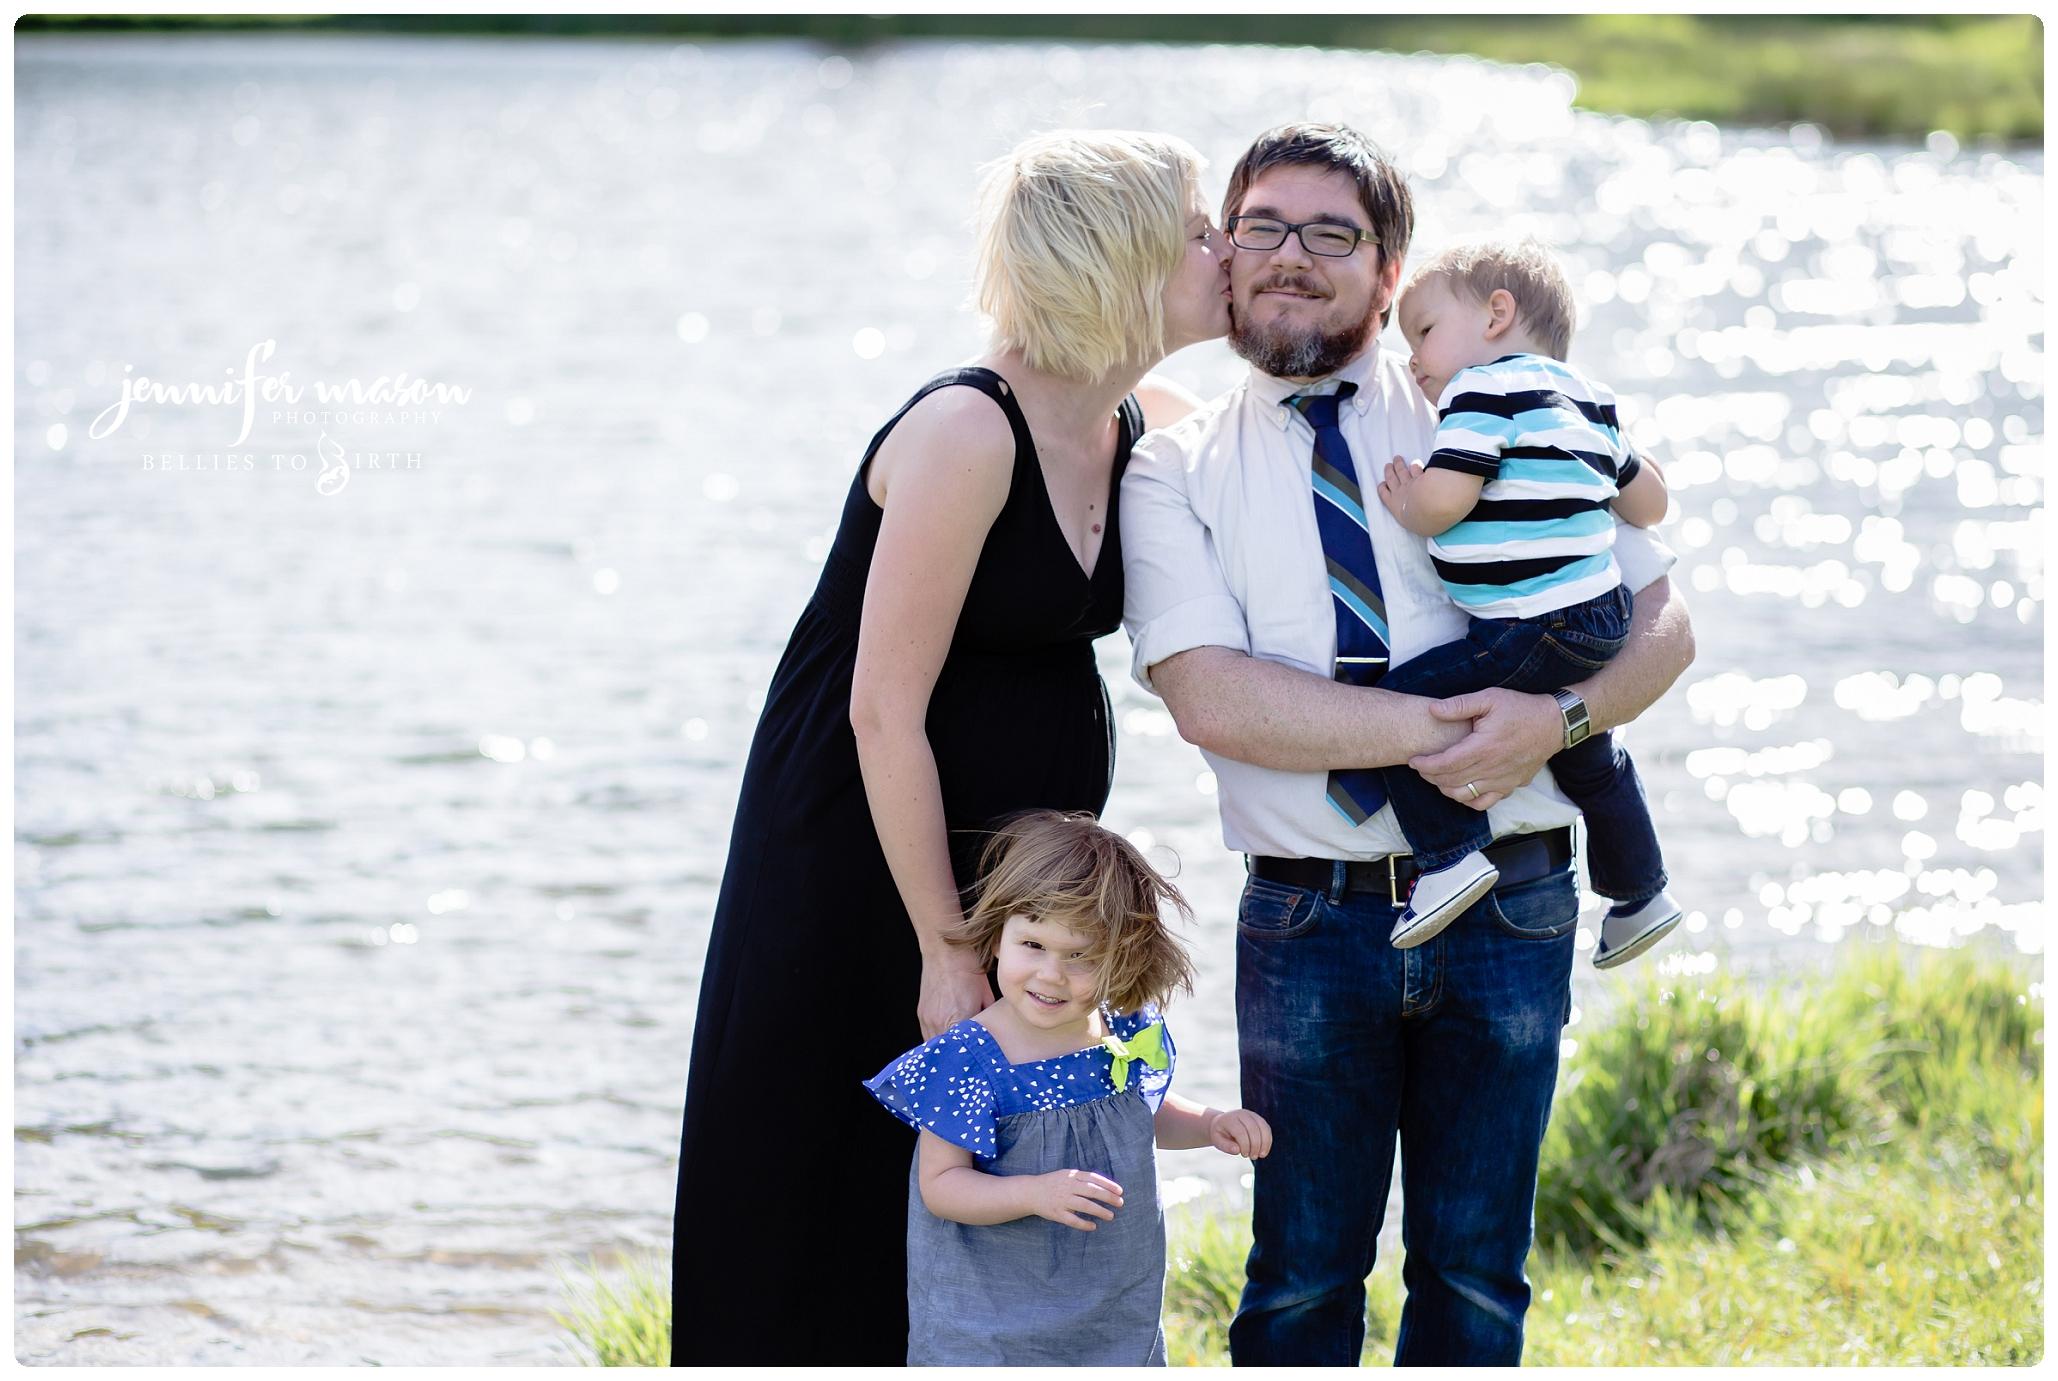 pregnancy photographer in Evergreen, maternity photography, natural maternity photographer